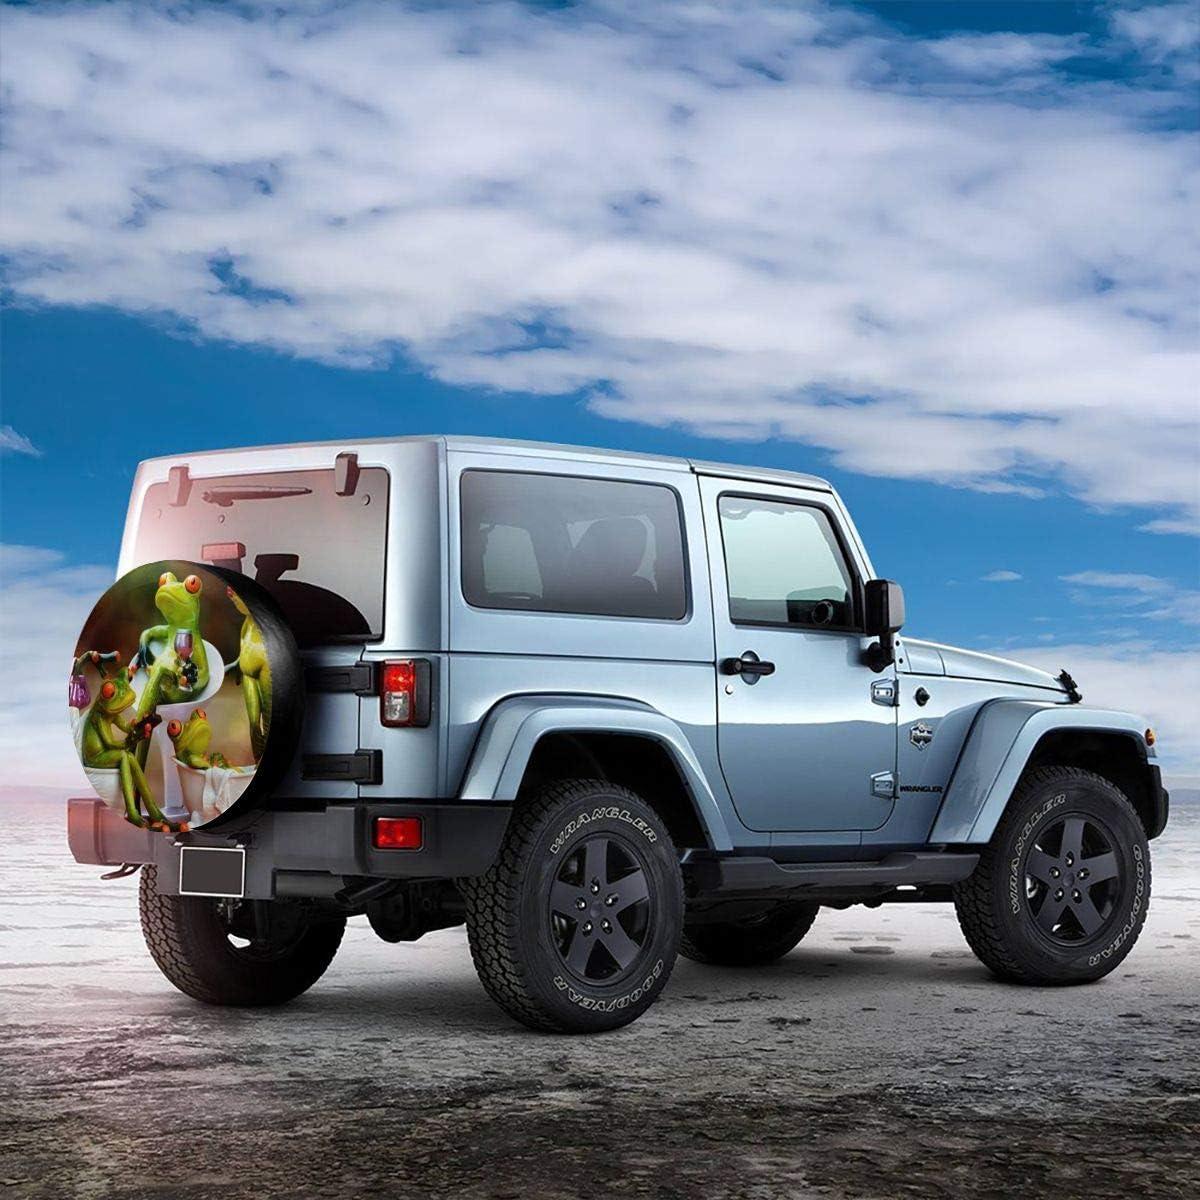 Universal Wheel Tire Protectors,Camper Travel Car Weatherproof Accessories gthytjhv Frogs Celebrate After Drinking Reserveradabdeckungs Diameter 14 Inch